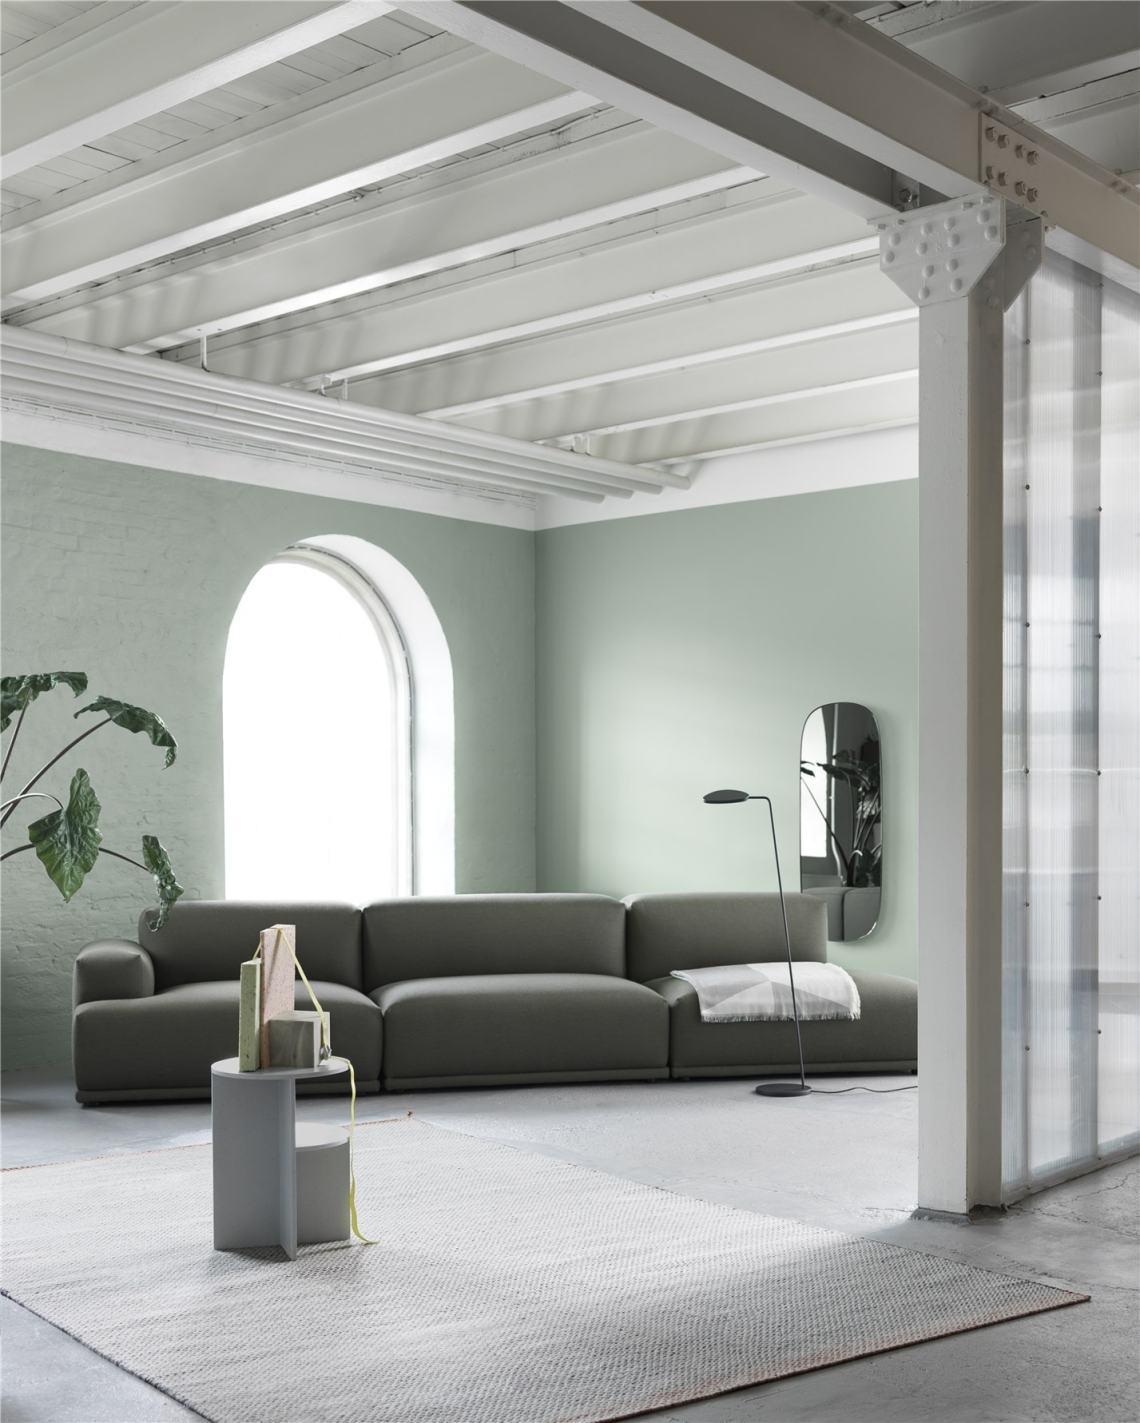 Connect-sofa-Fiord-961-Halves-Ply-Leaf-floor-lamp-Framed-mirror-org